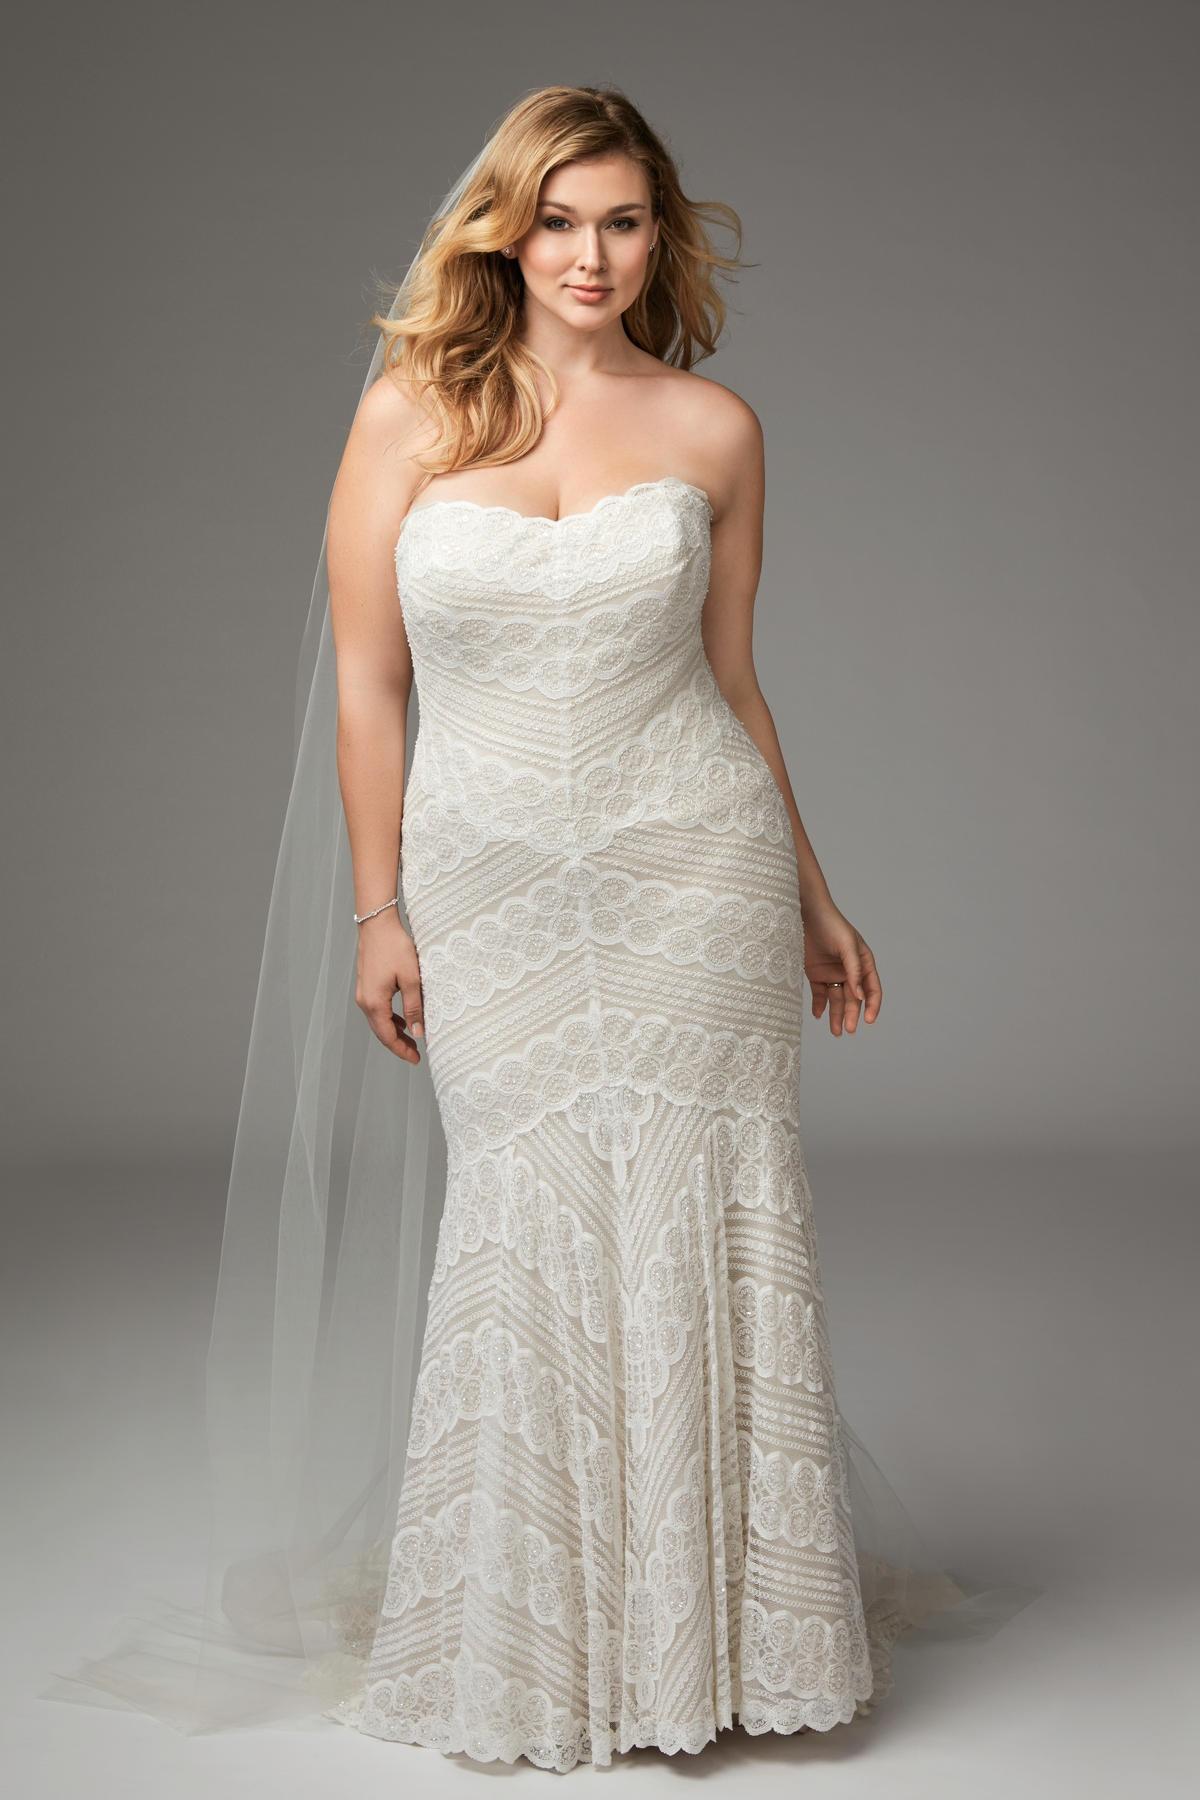 wedding dresses for plus size women photo - 1